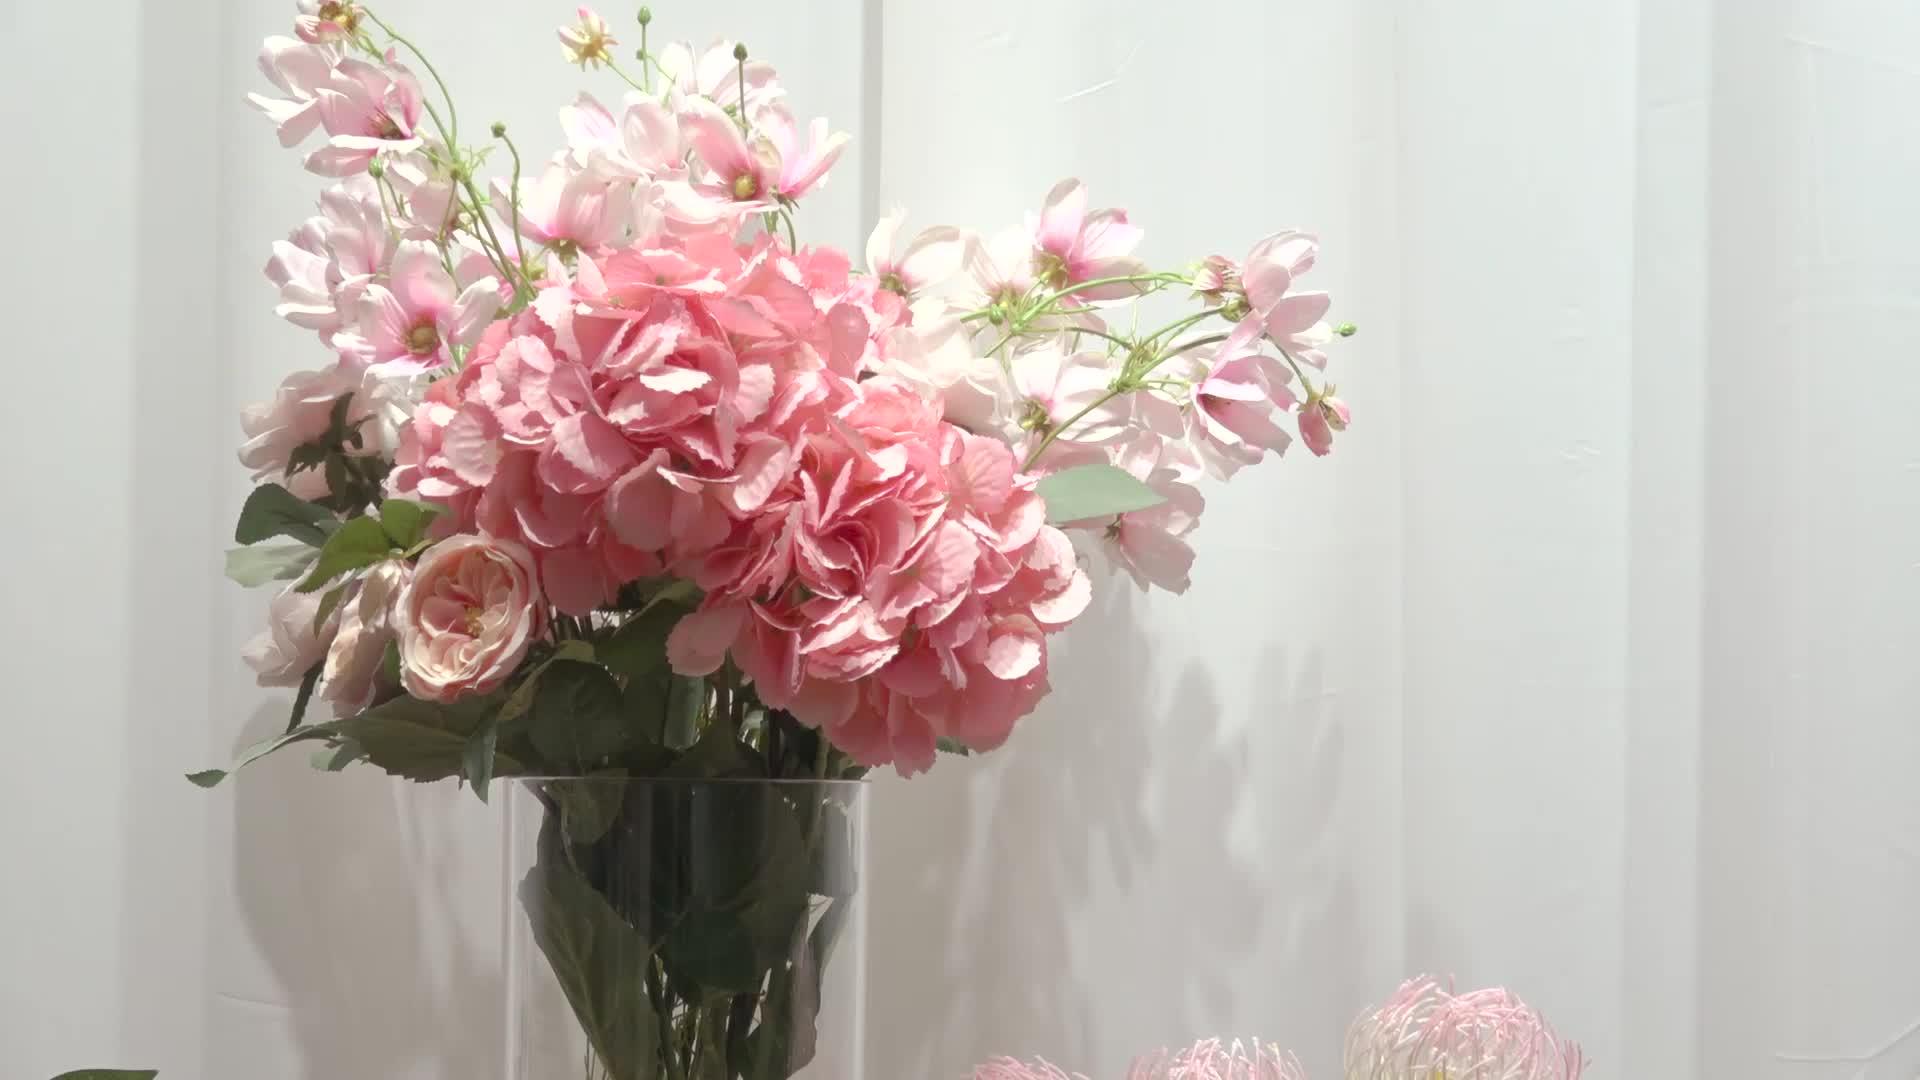 VR150-200 tall wedding modern small round glass flower vase decoration mariage